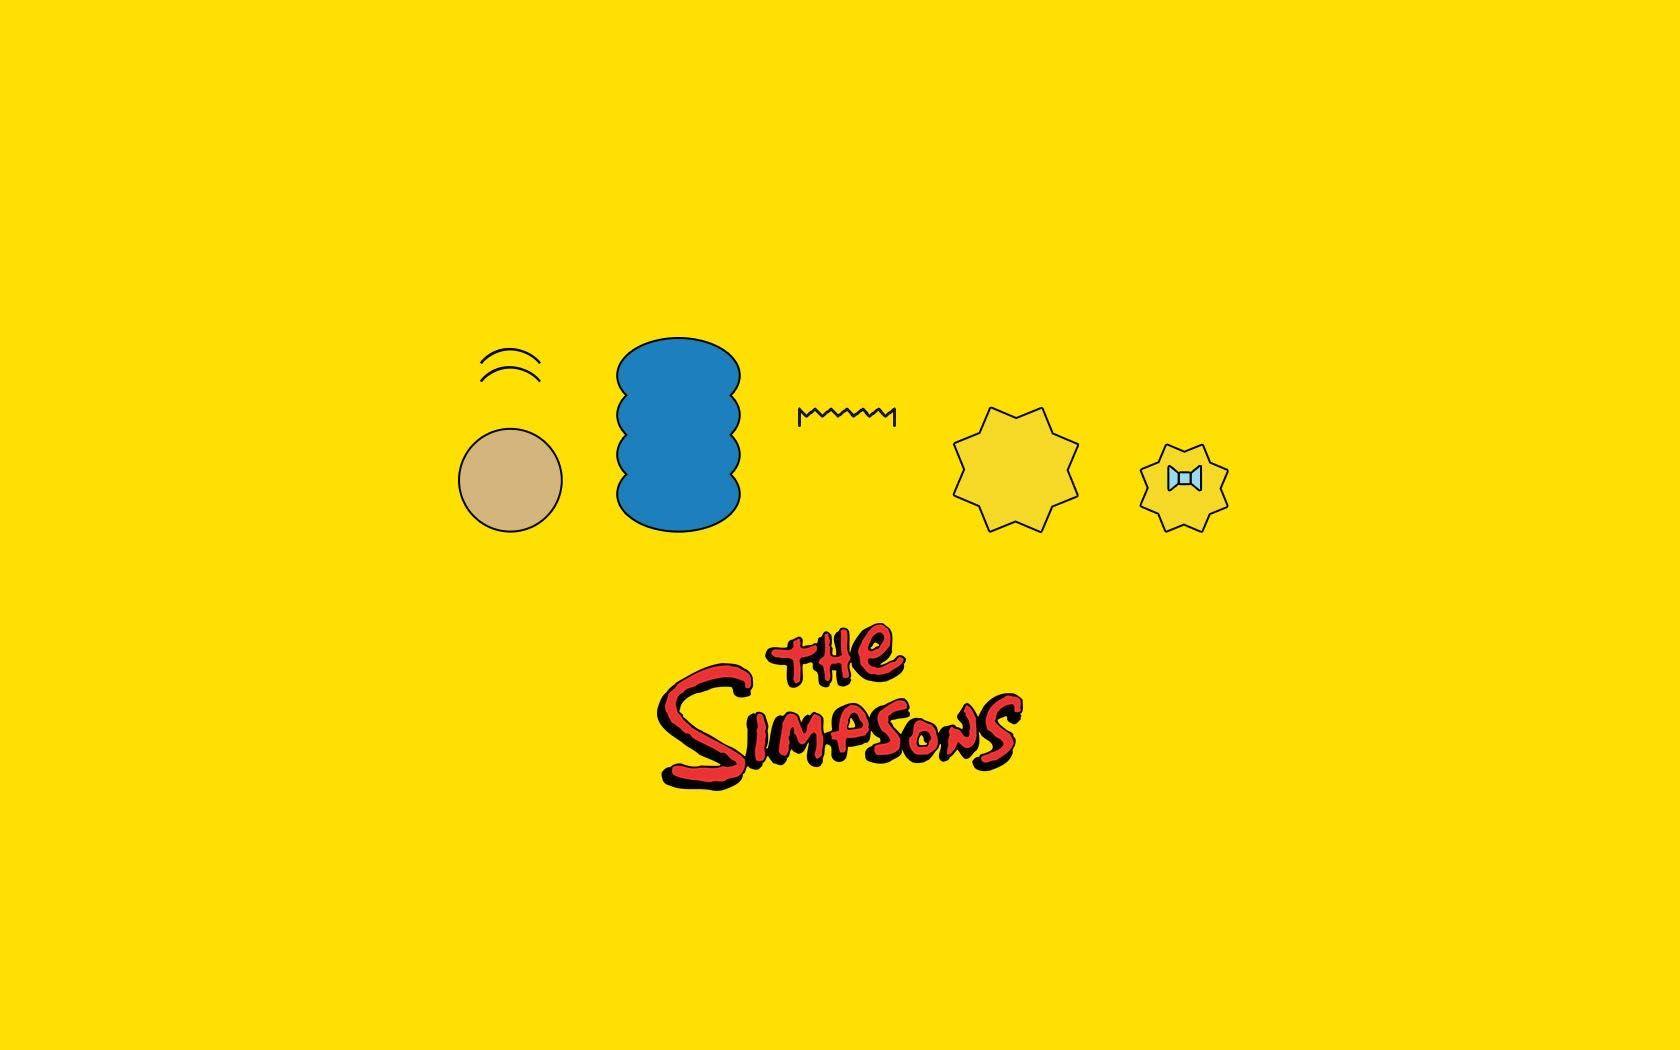 Fondos  - •The Simpsons• 💛